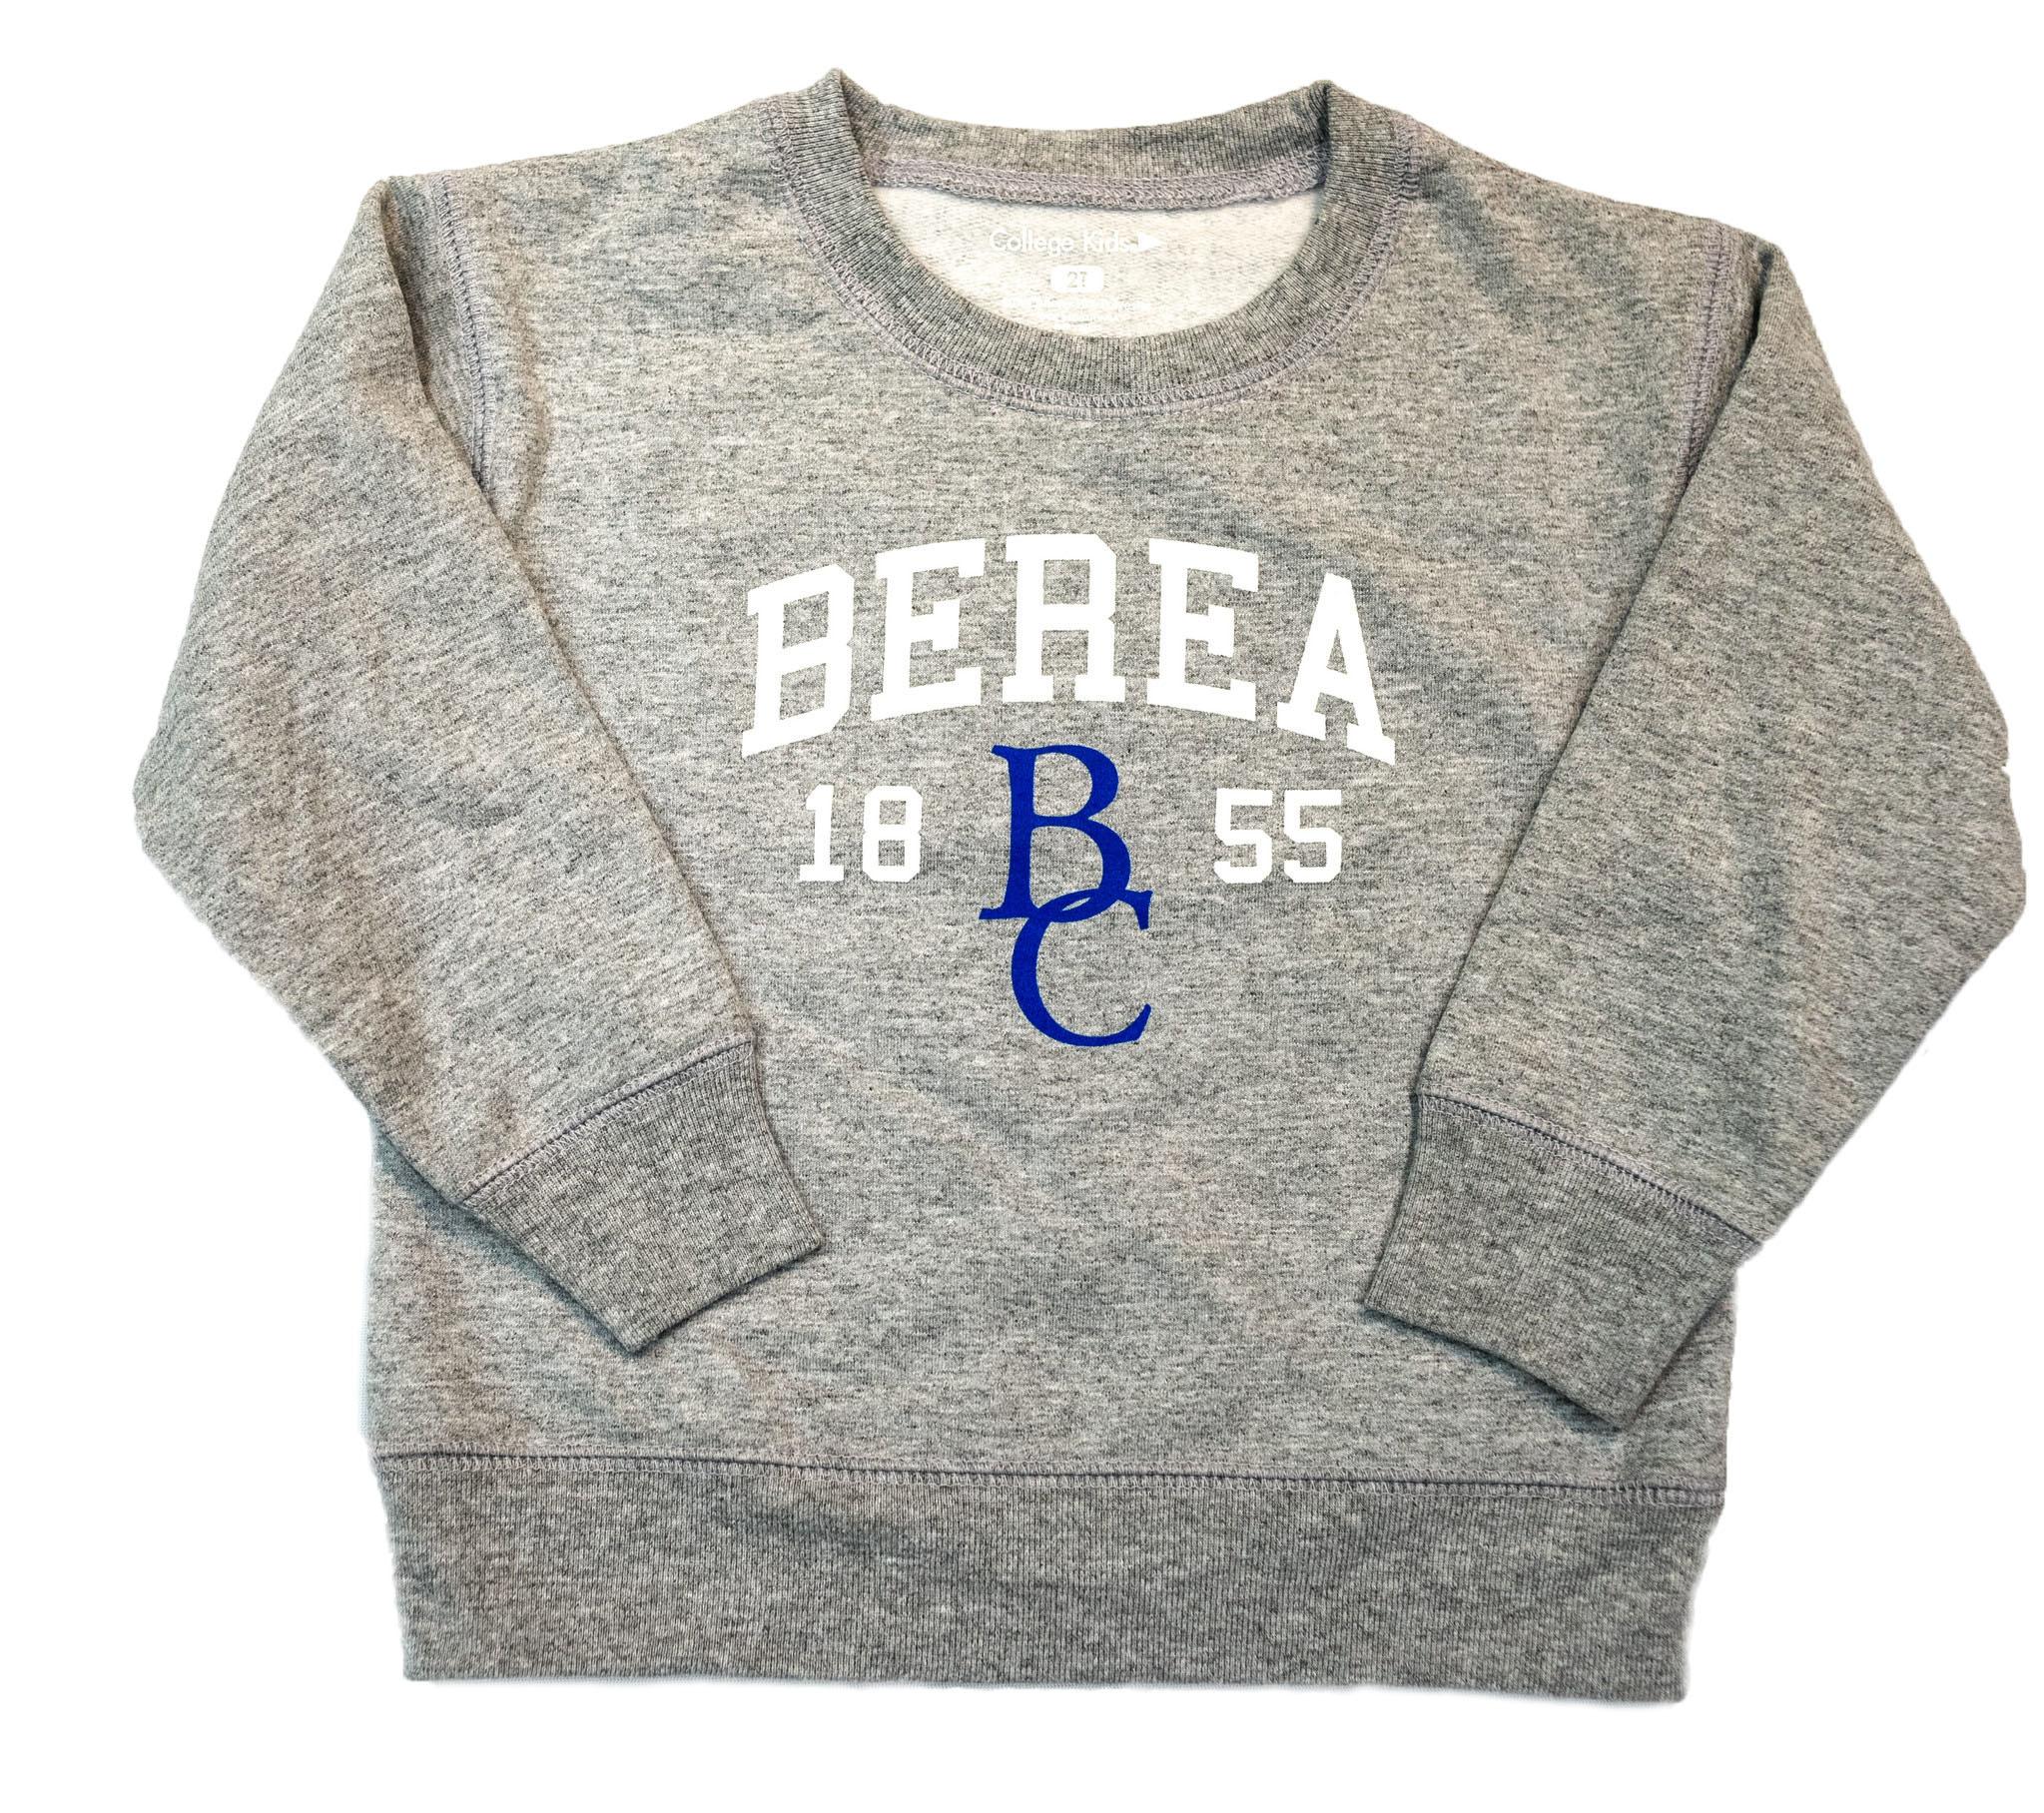 Pullover,Youth,Gray,Berea-1